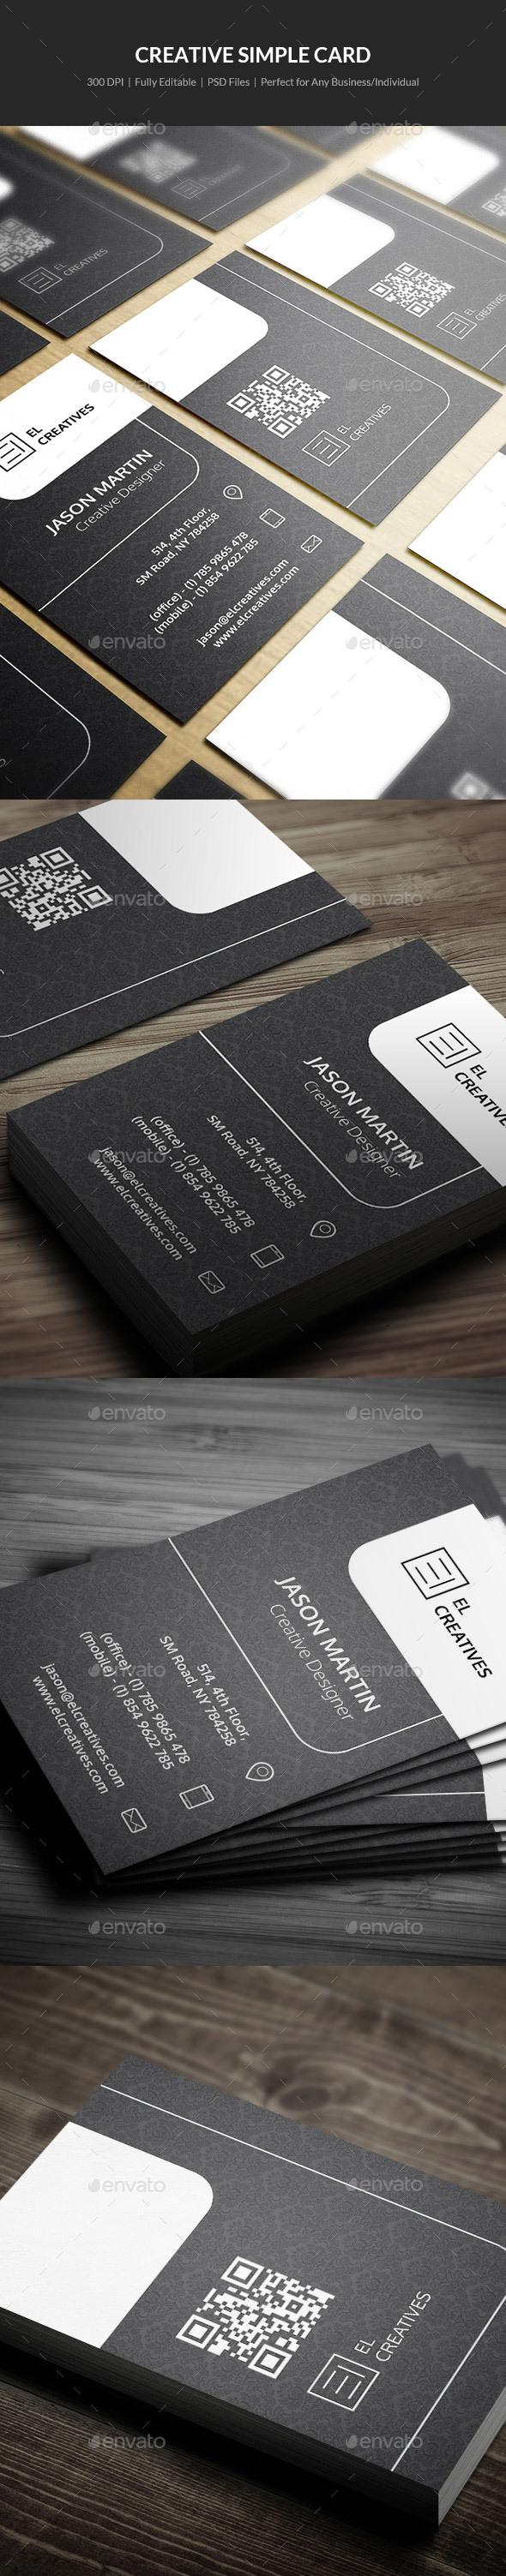 Creative Simple Business Card - 10 - Creative Business Cards